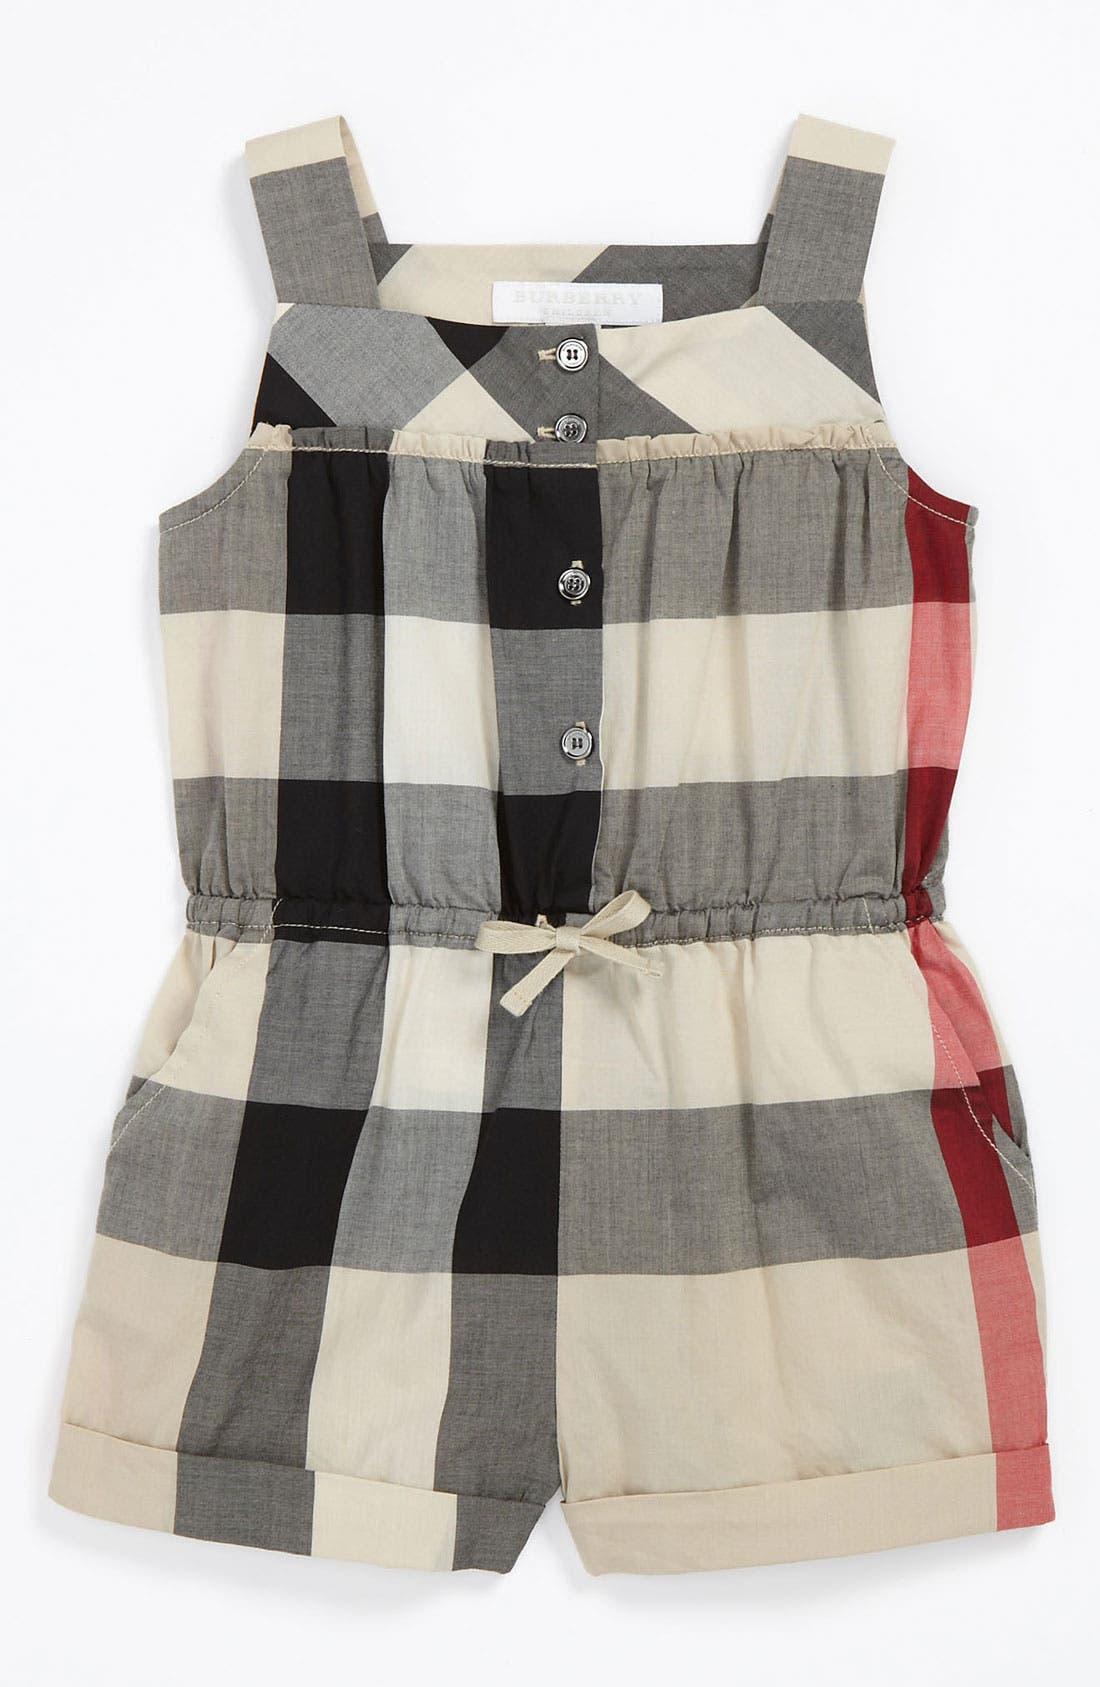 Main Image - Burberry 'Rosemarie' Coveralls (Baby)